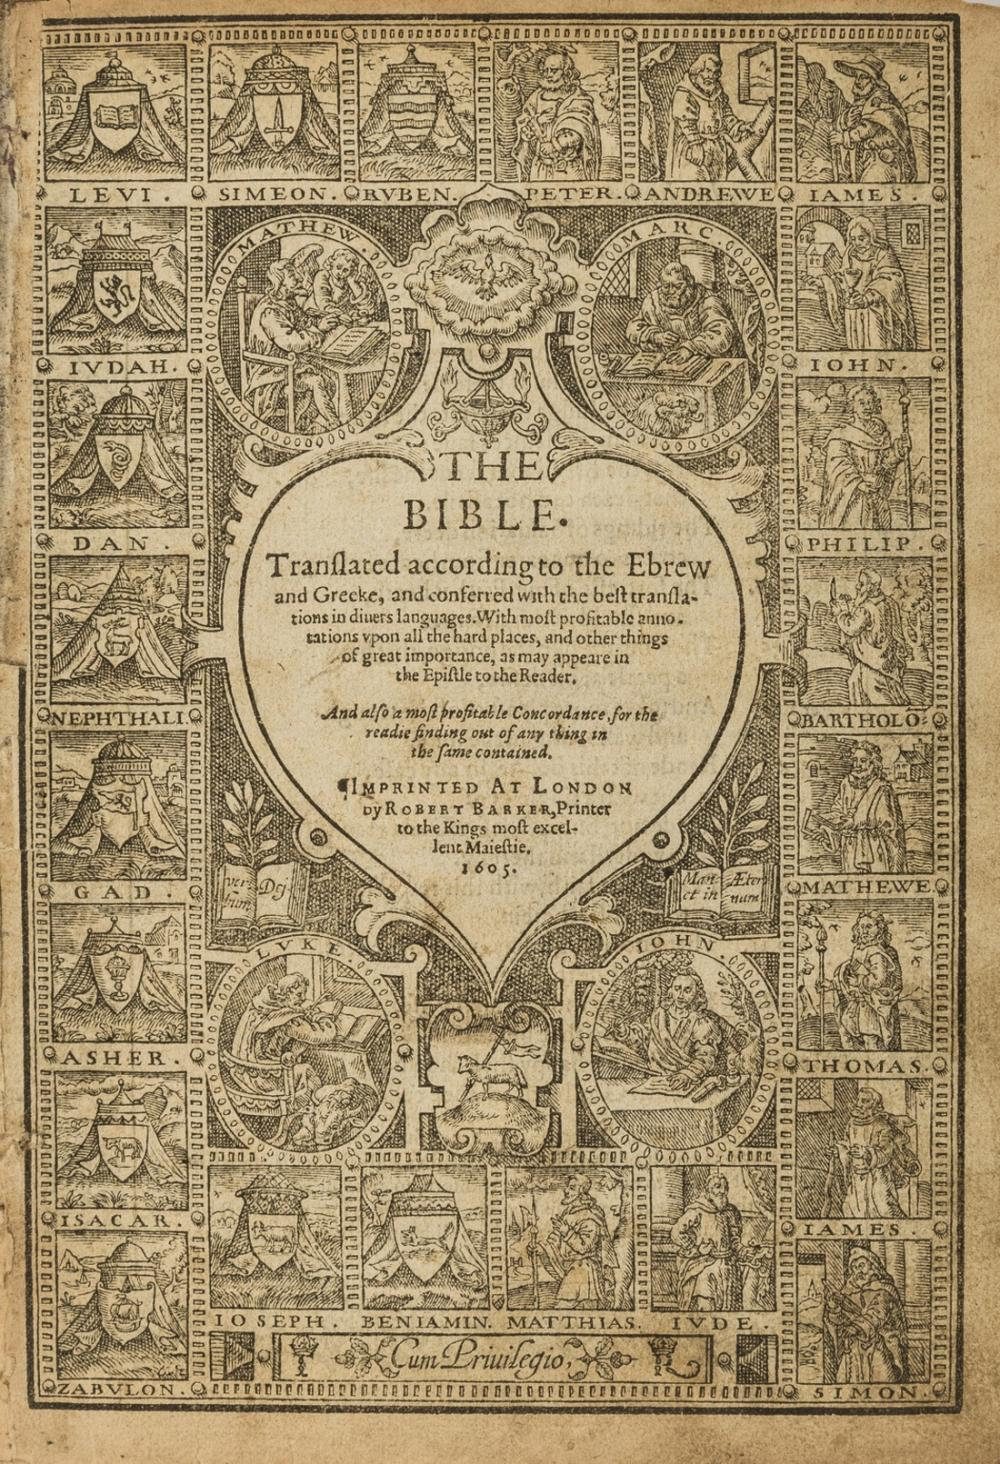 Bible (English) The Bible, 1605.